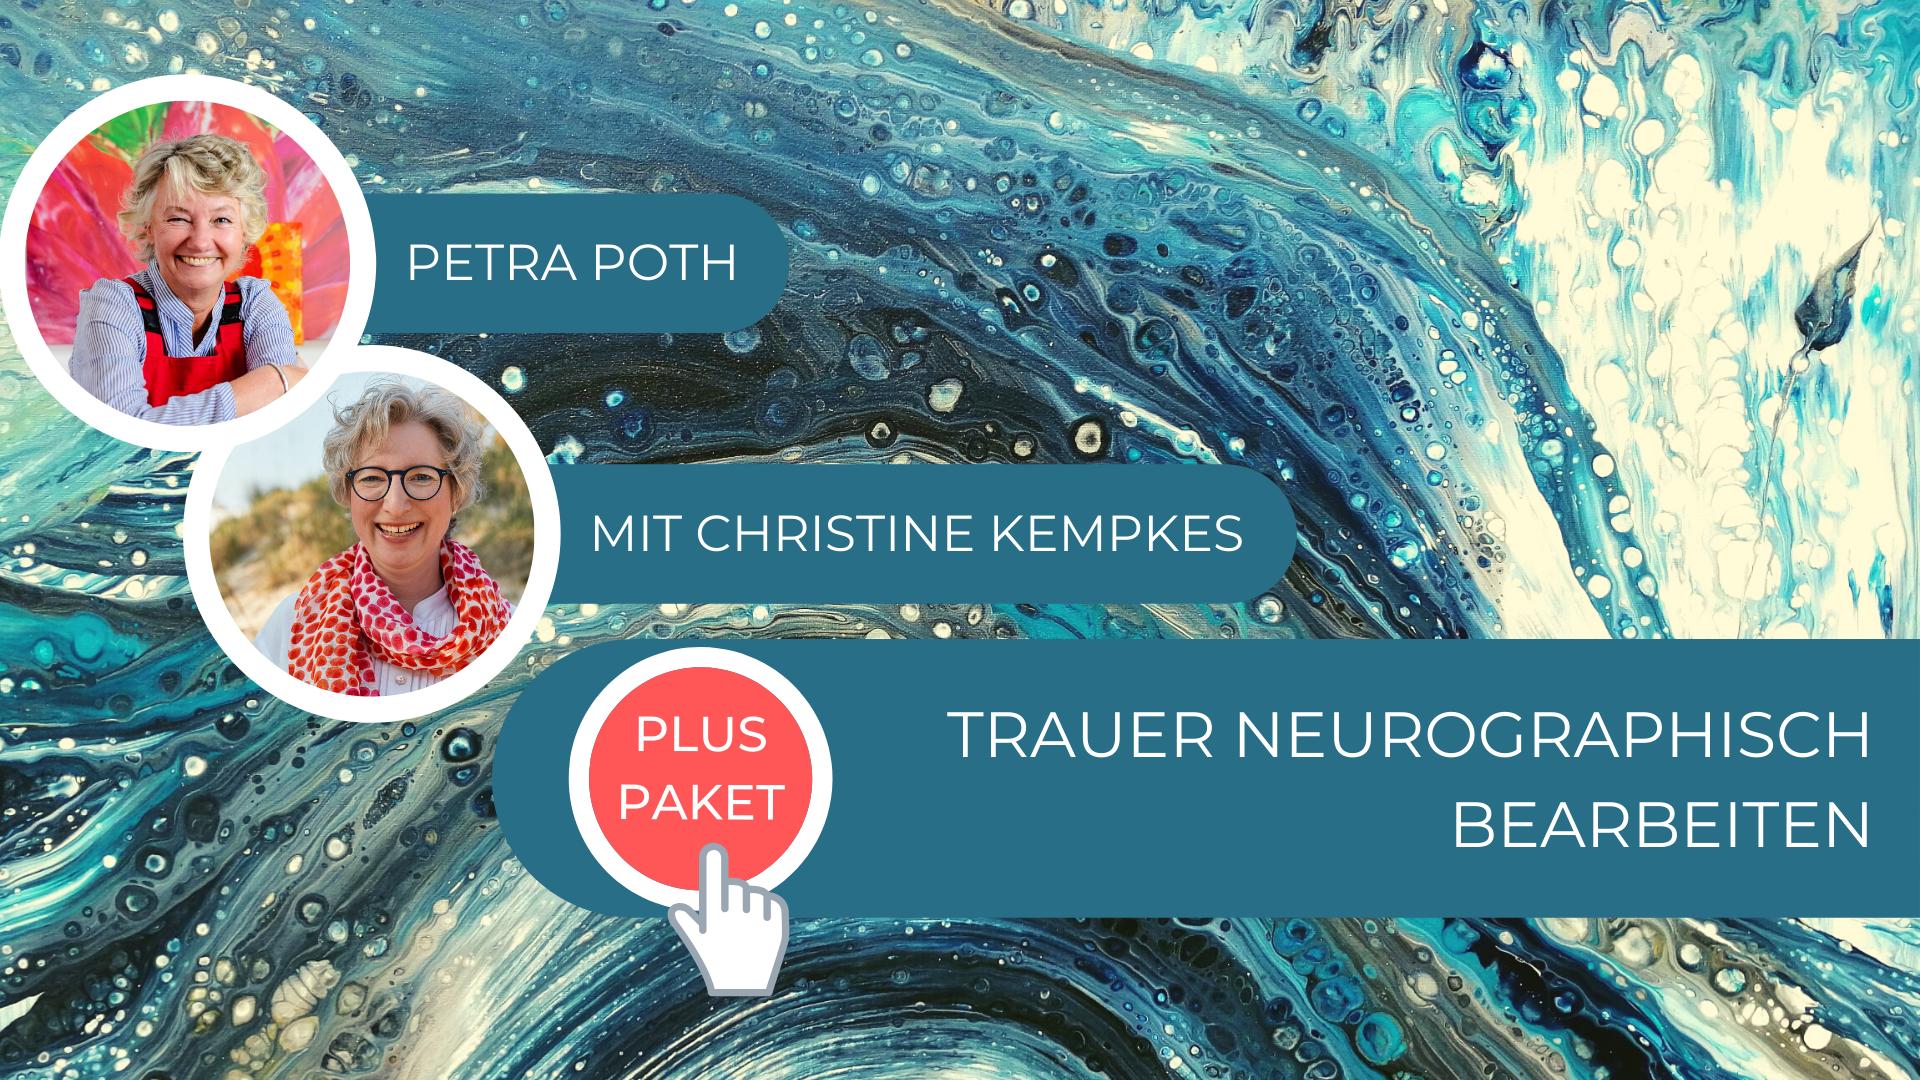 Trauer neurographisch bearbeiten - Webinar